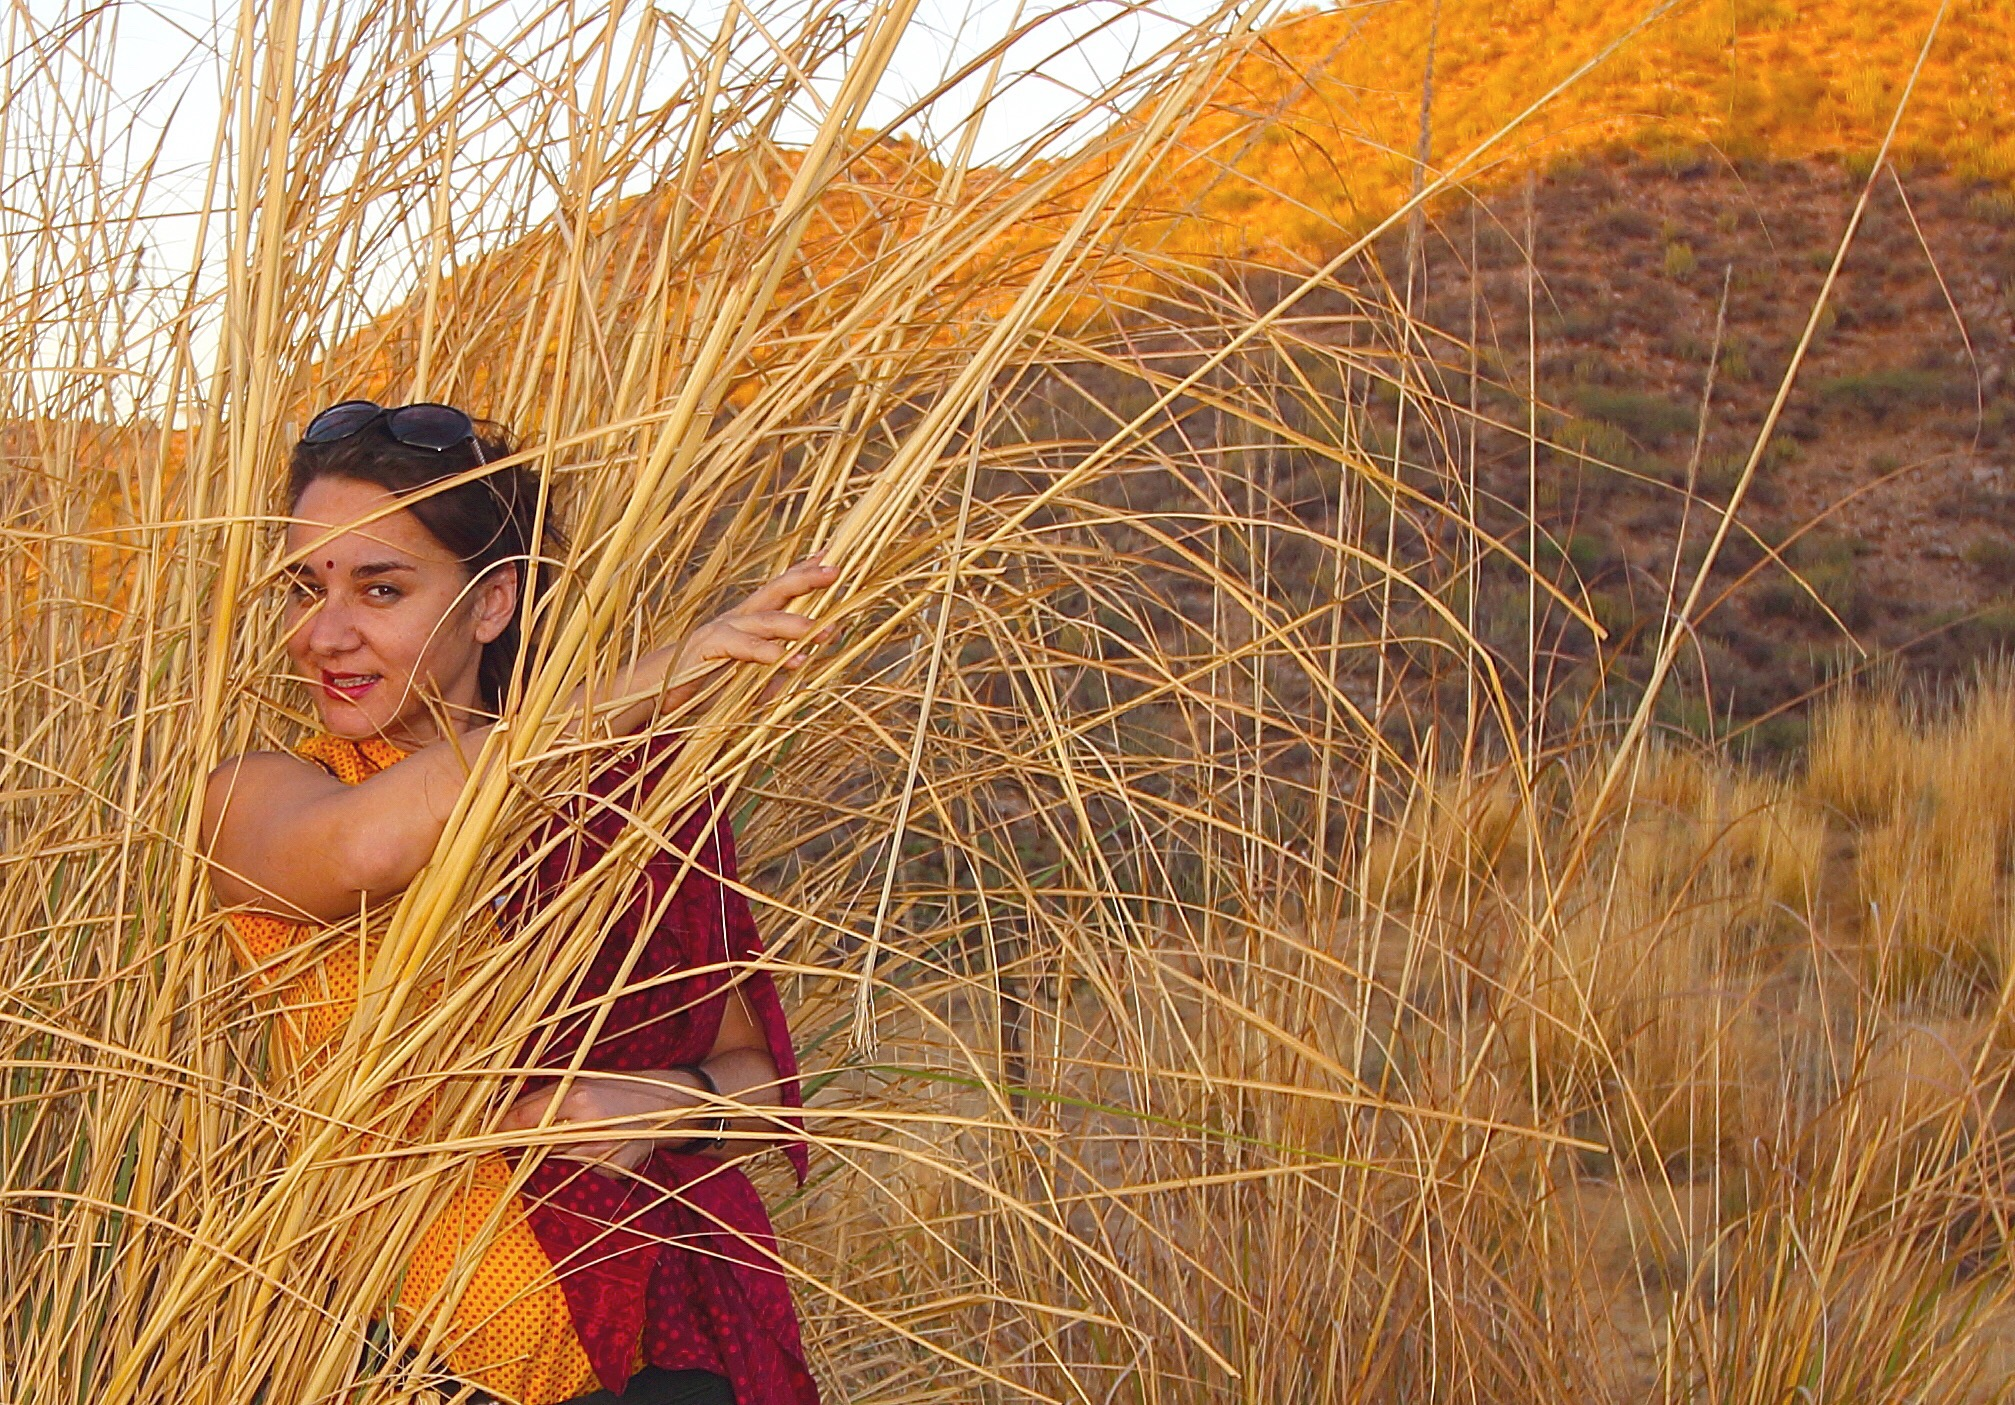 Joana in the grass